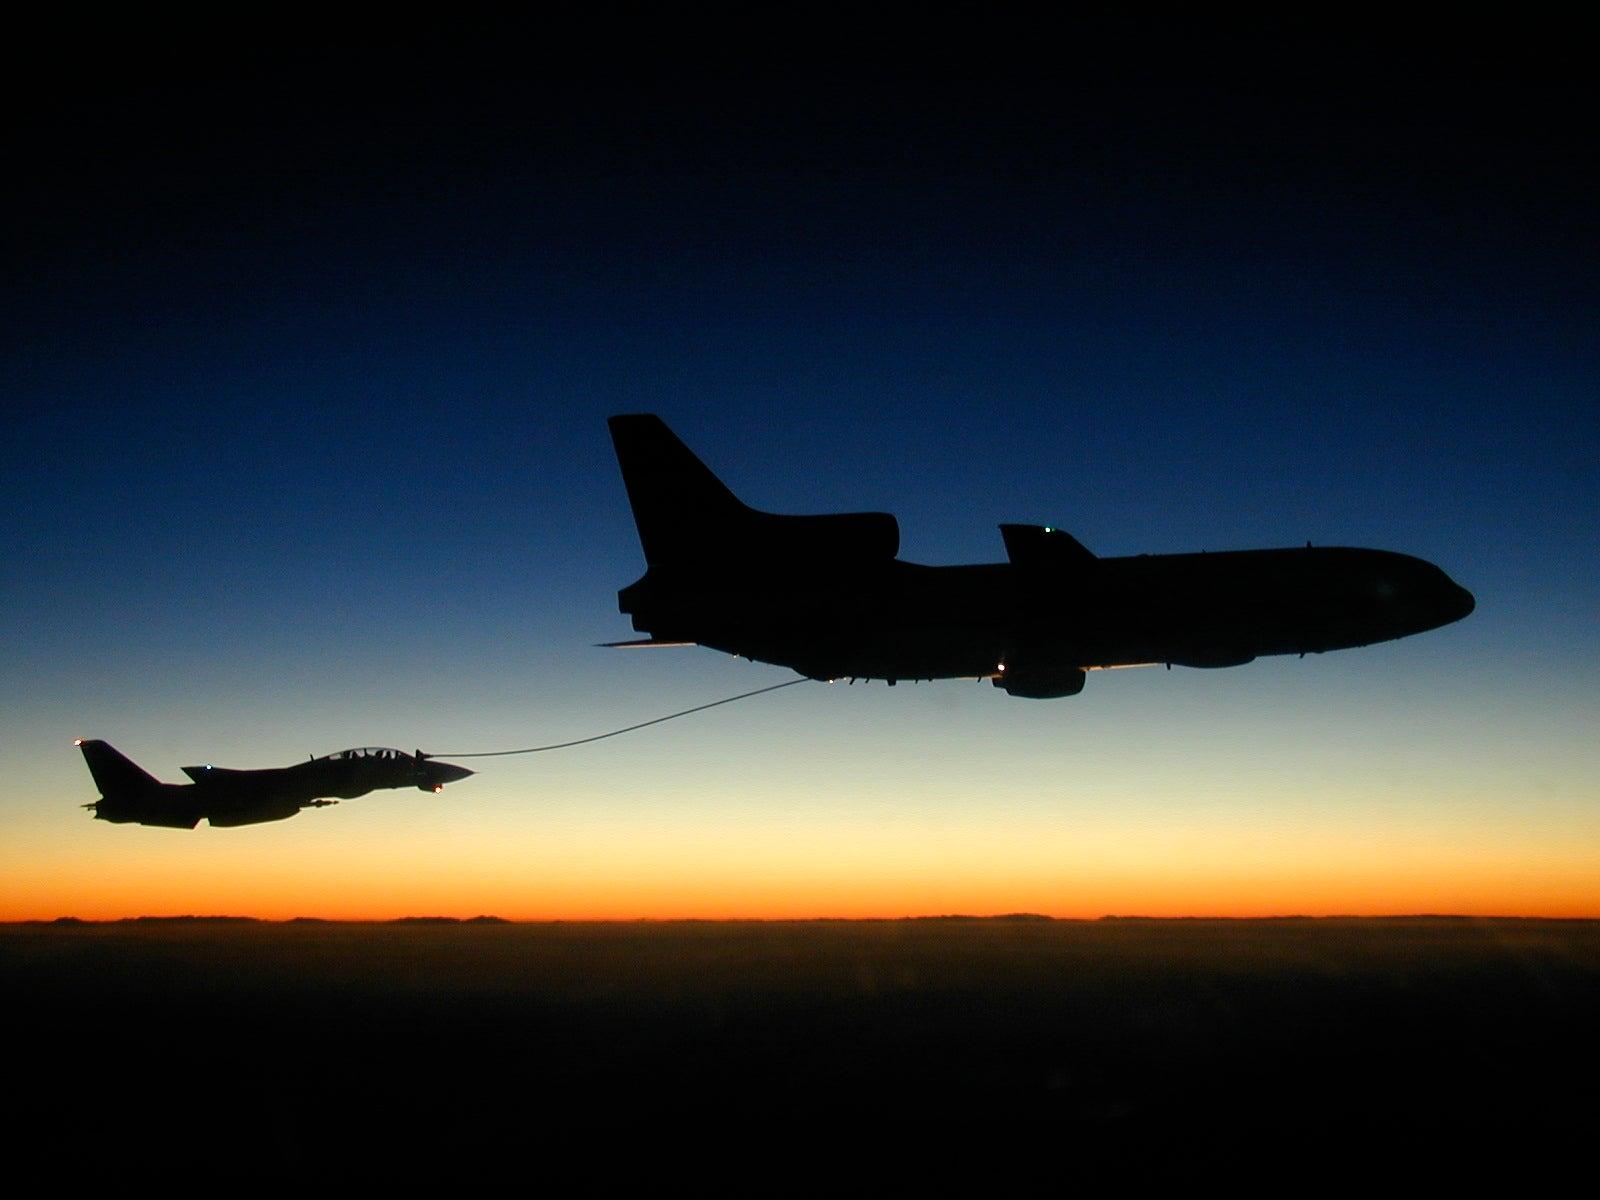 Blue Fighter Jets Oihnmycmwsmsijuoht